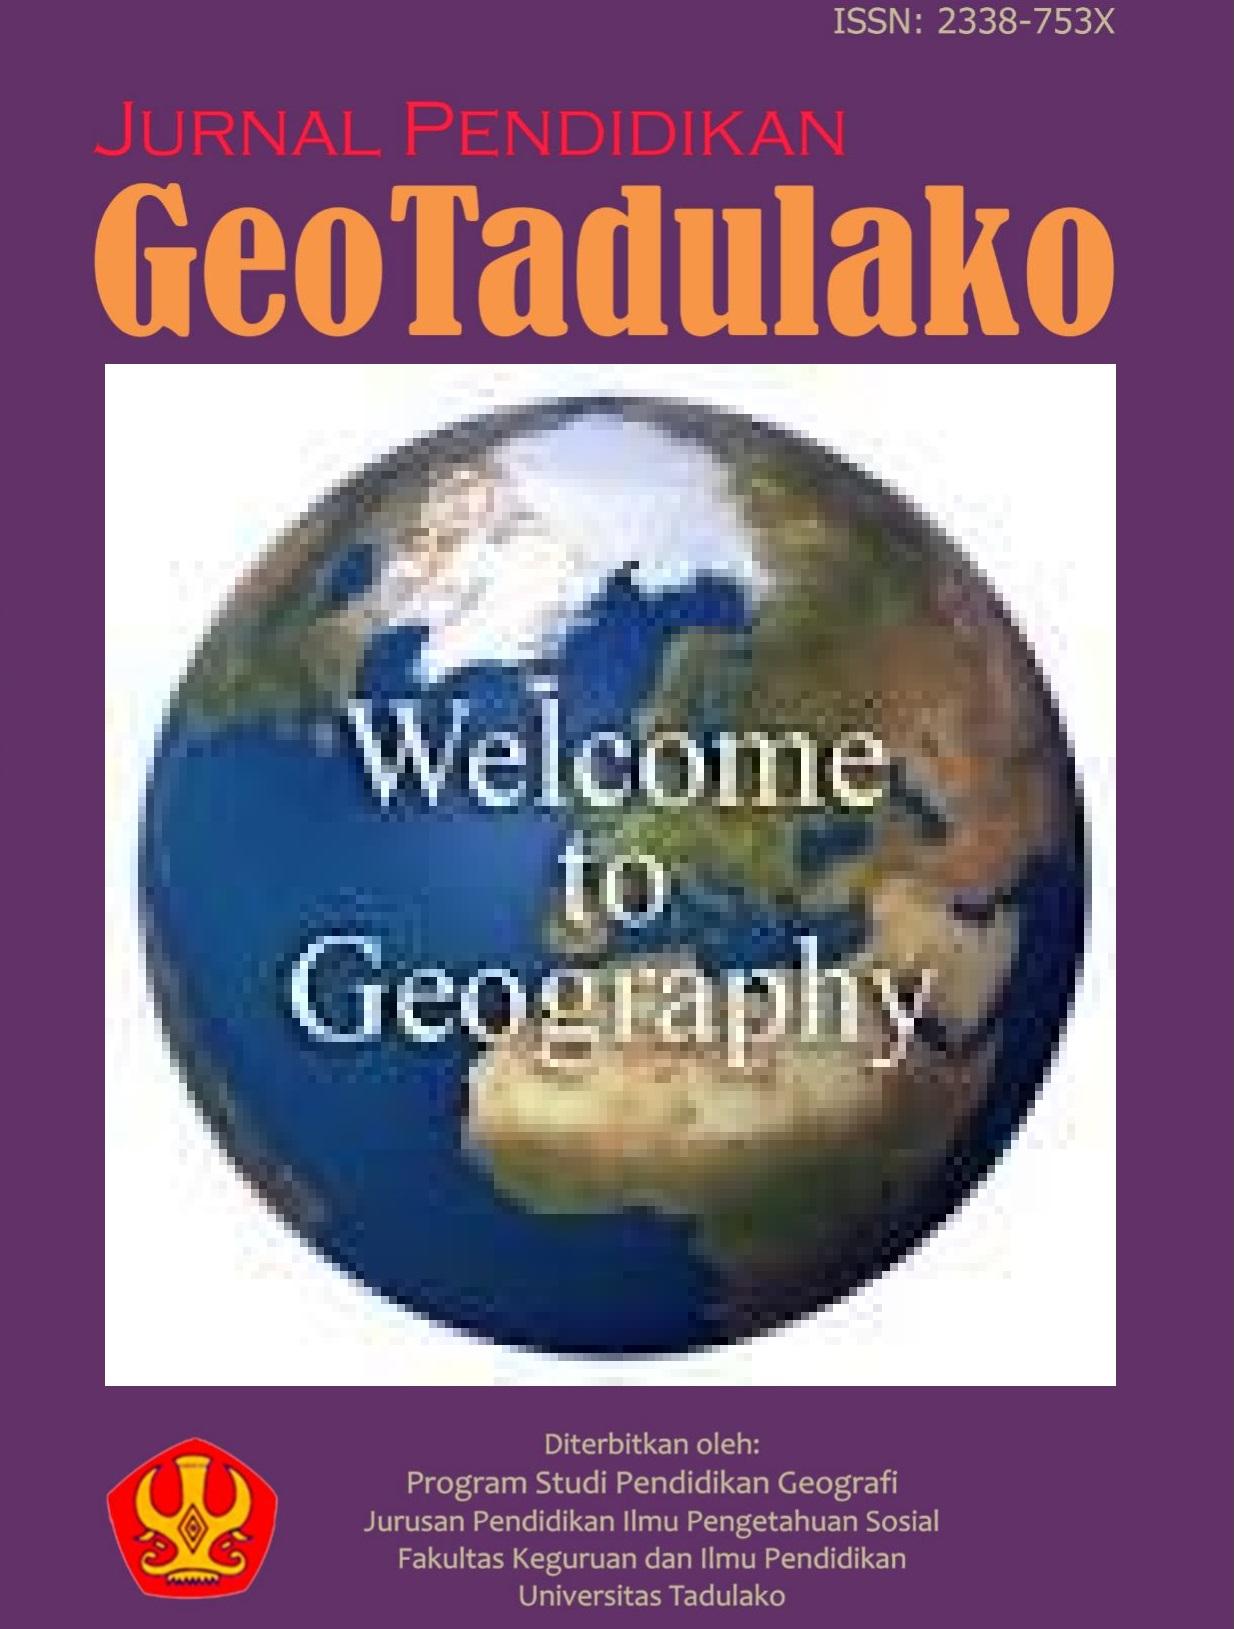 JURNAL PENDIDIKAN GEOGRAFI FKIP UNIVERSITAS TADULAKO